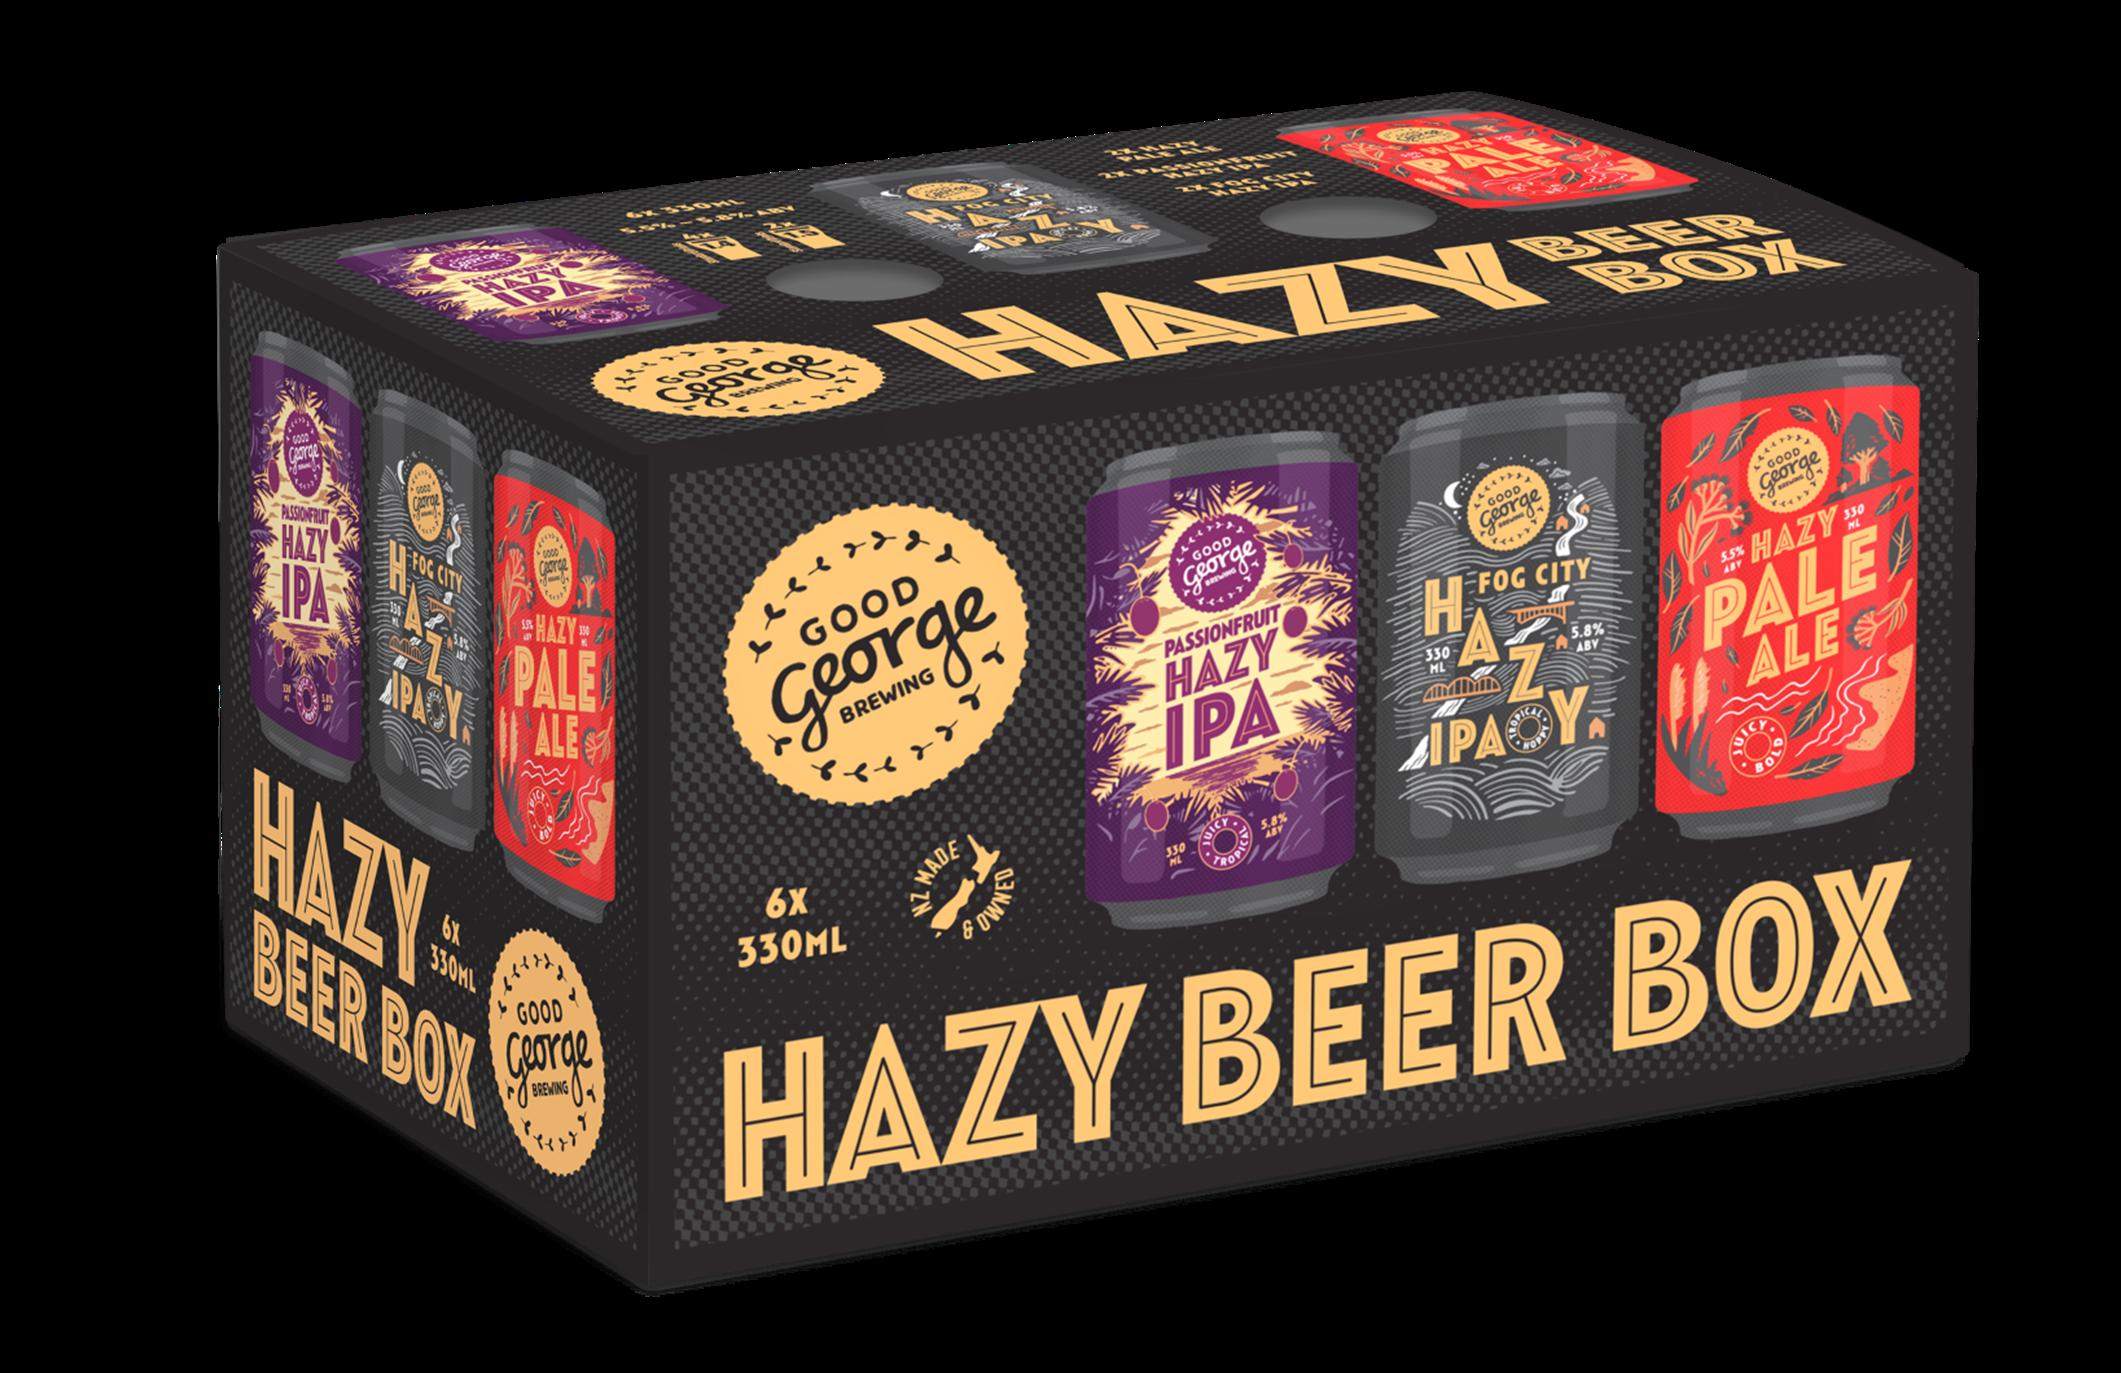 Good George Hazy Beer Box